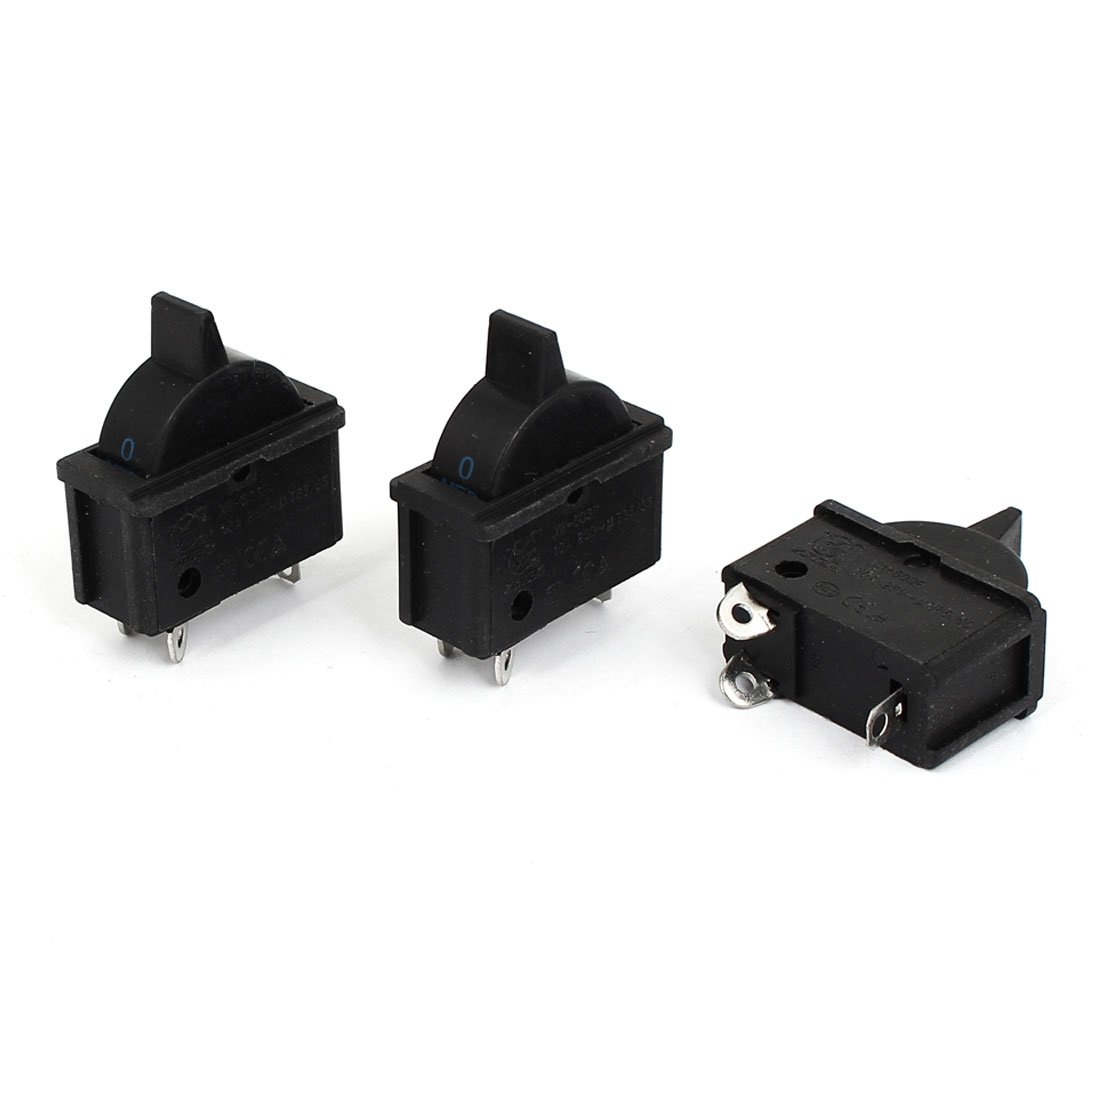 250V 10A SPDT 3 Position 3 Terminal Hair Dryer Soldering Boat Rocker Switch 3Pcs